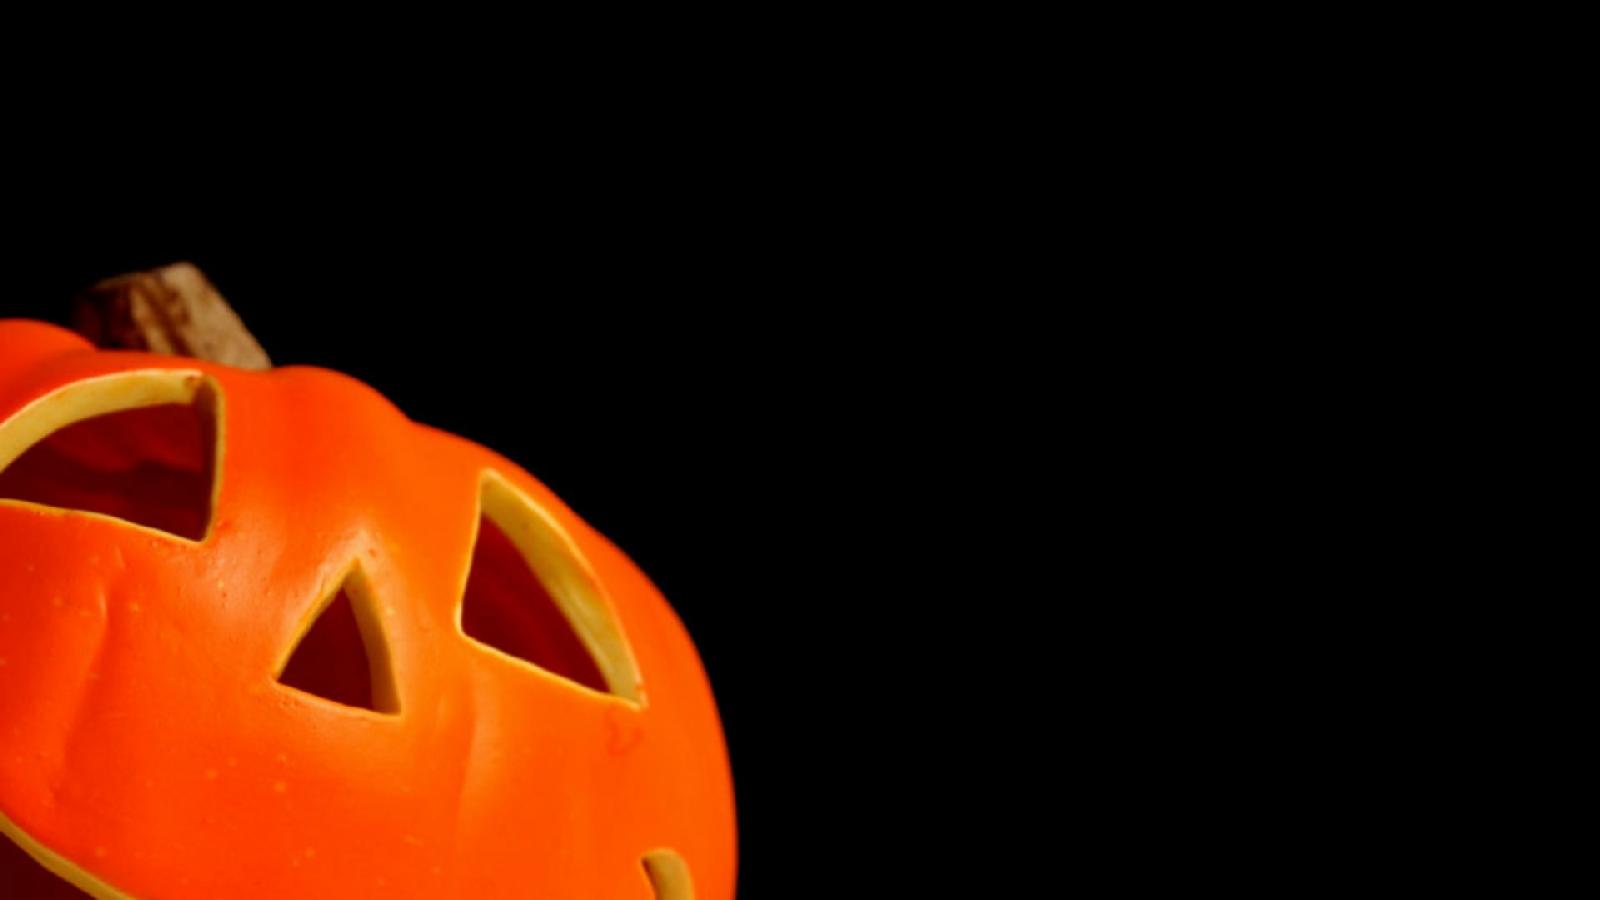 http://4.bp.blogspot.com/-meWh1MKg4Zc/UEPoHNTSS1I/AAAAAAAAKvE/2tSwUf19f5U/s1600/Halloween_98-712792.jpg